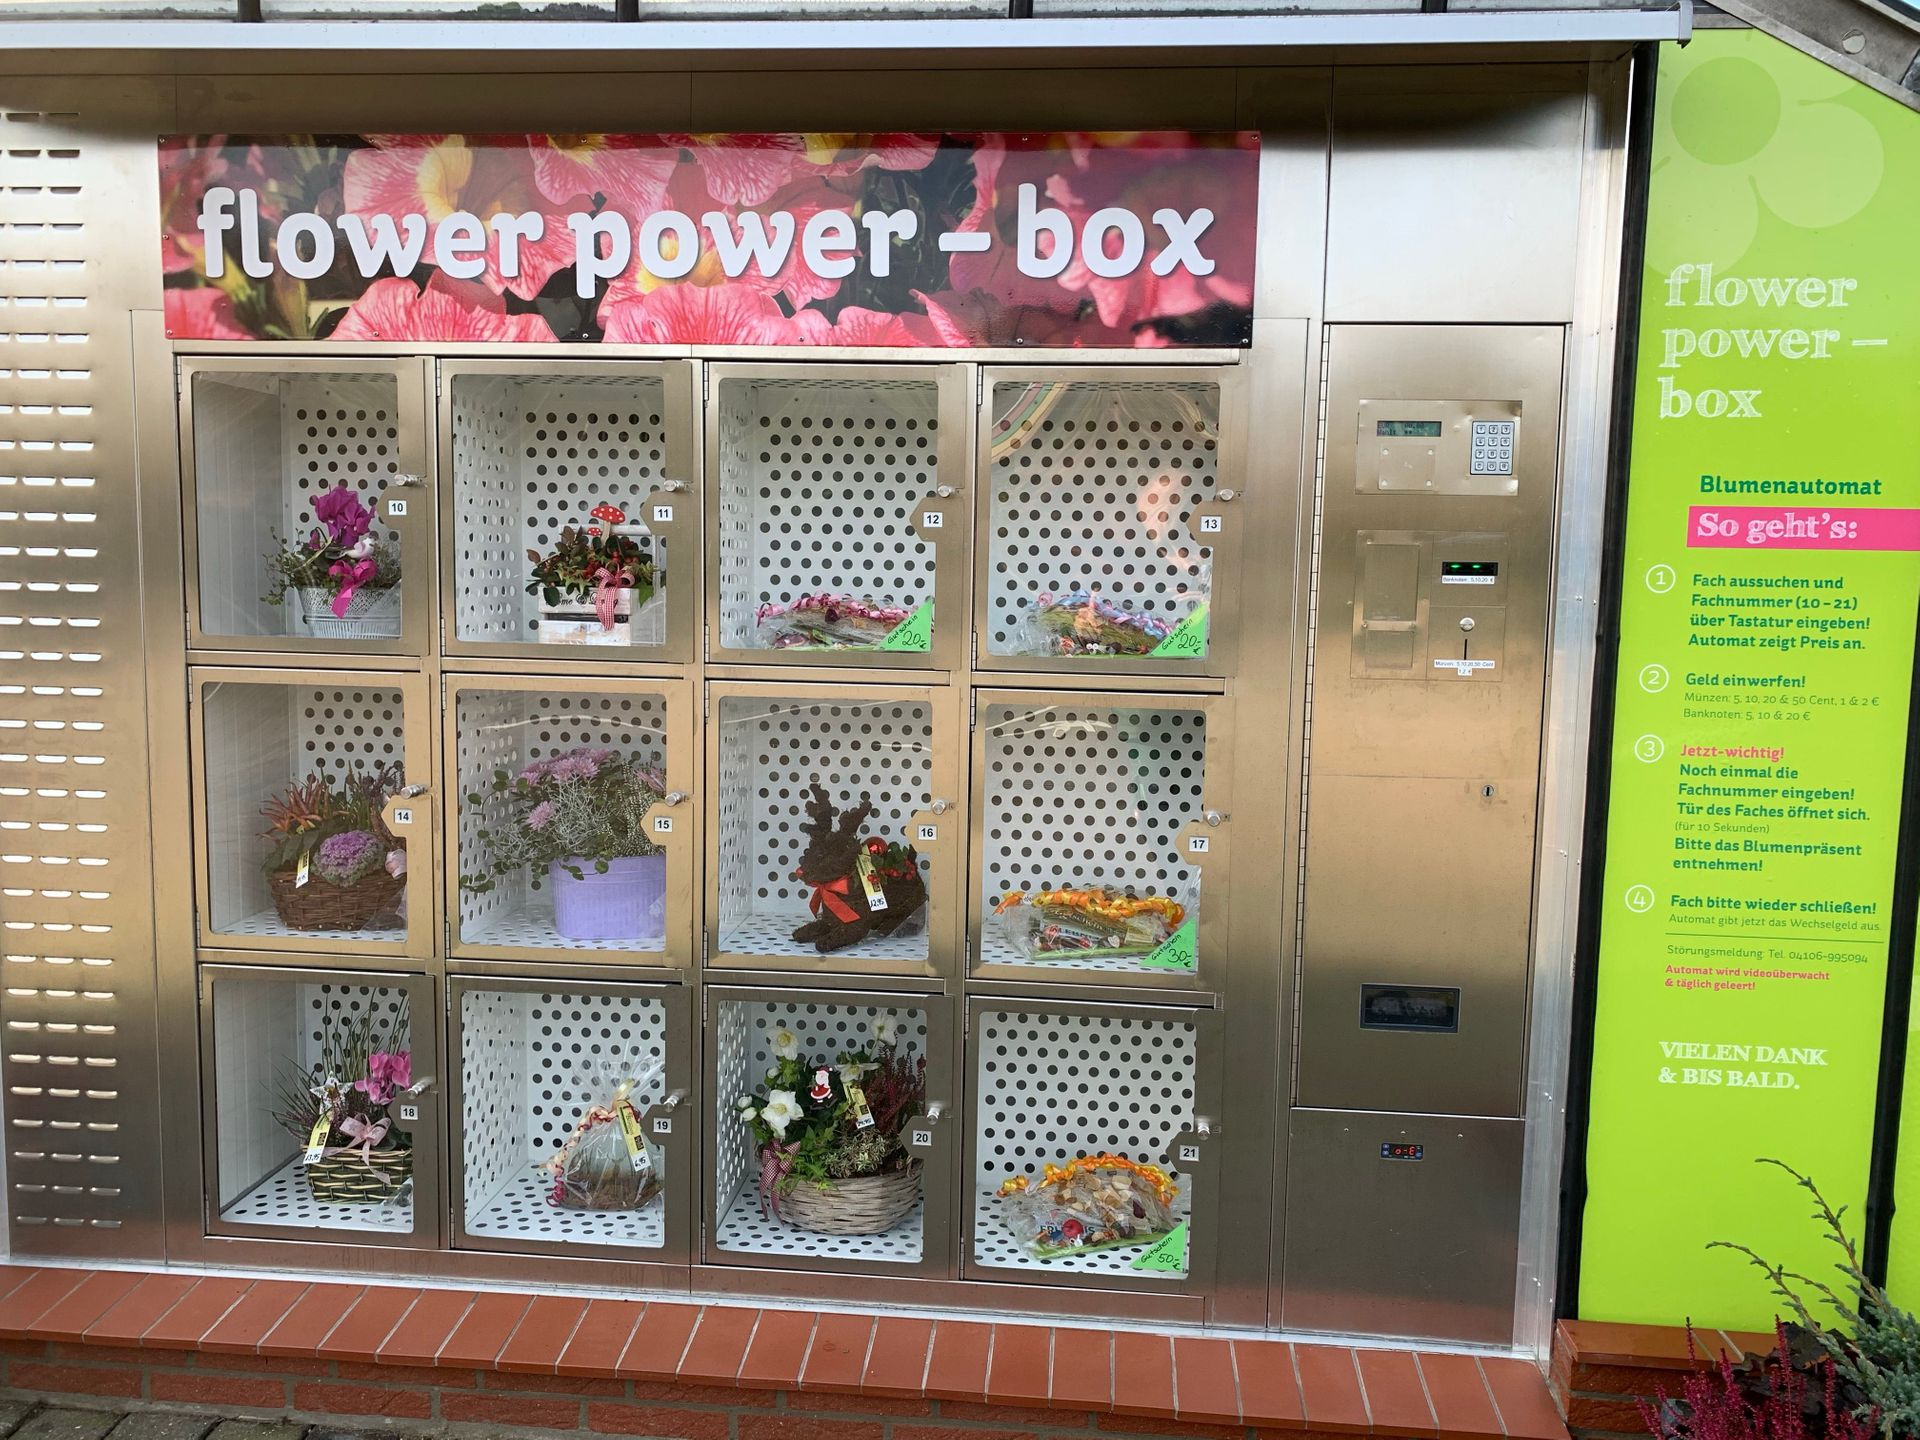 flower power - box | Gärtnerei Bronstert